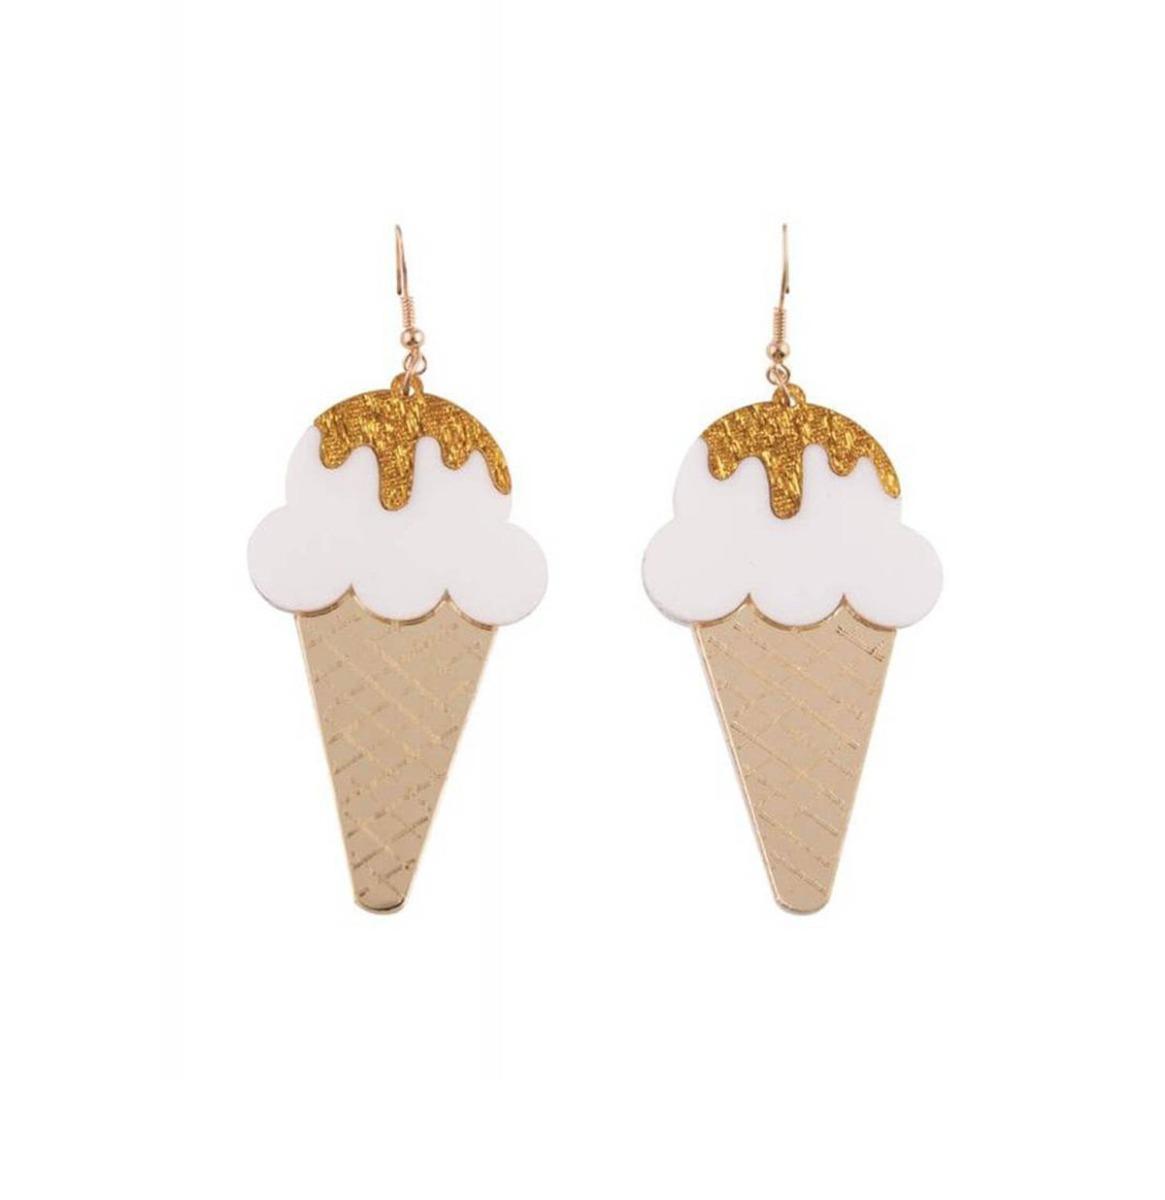 Sonny Ice Cream Earrings